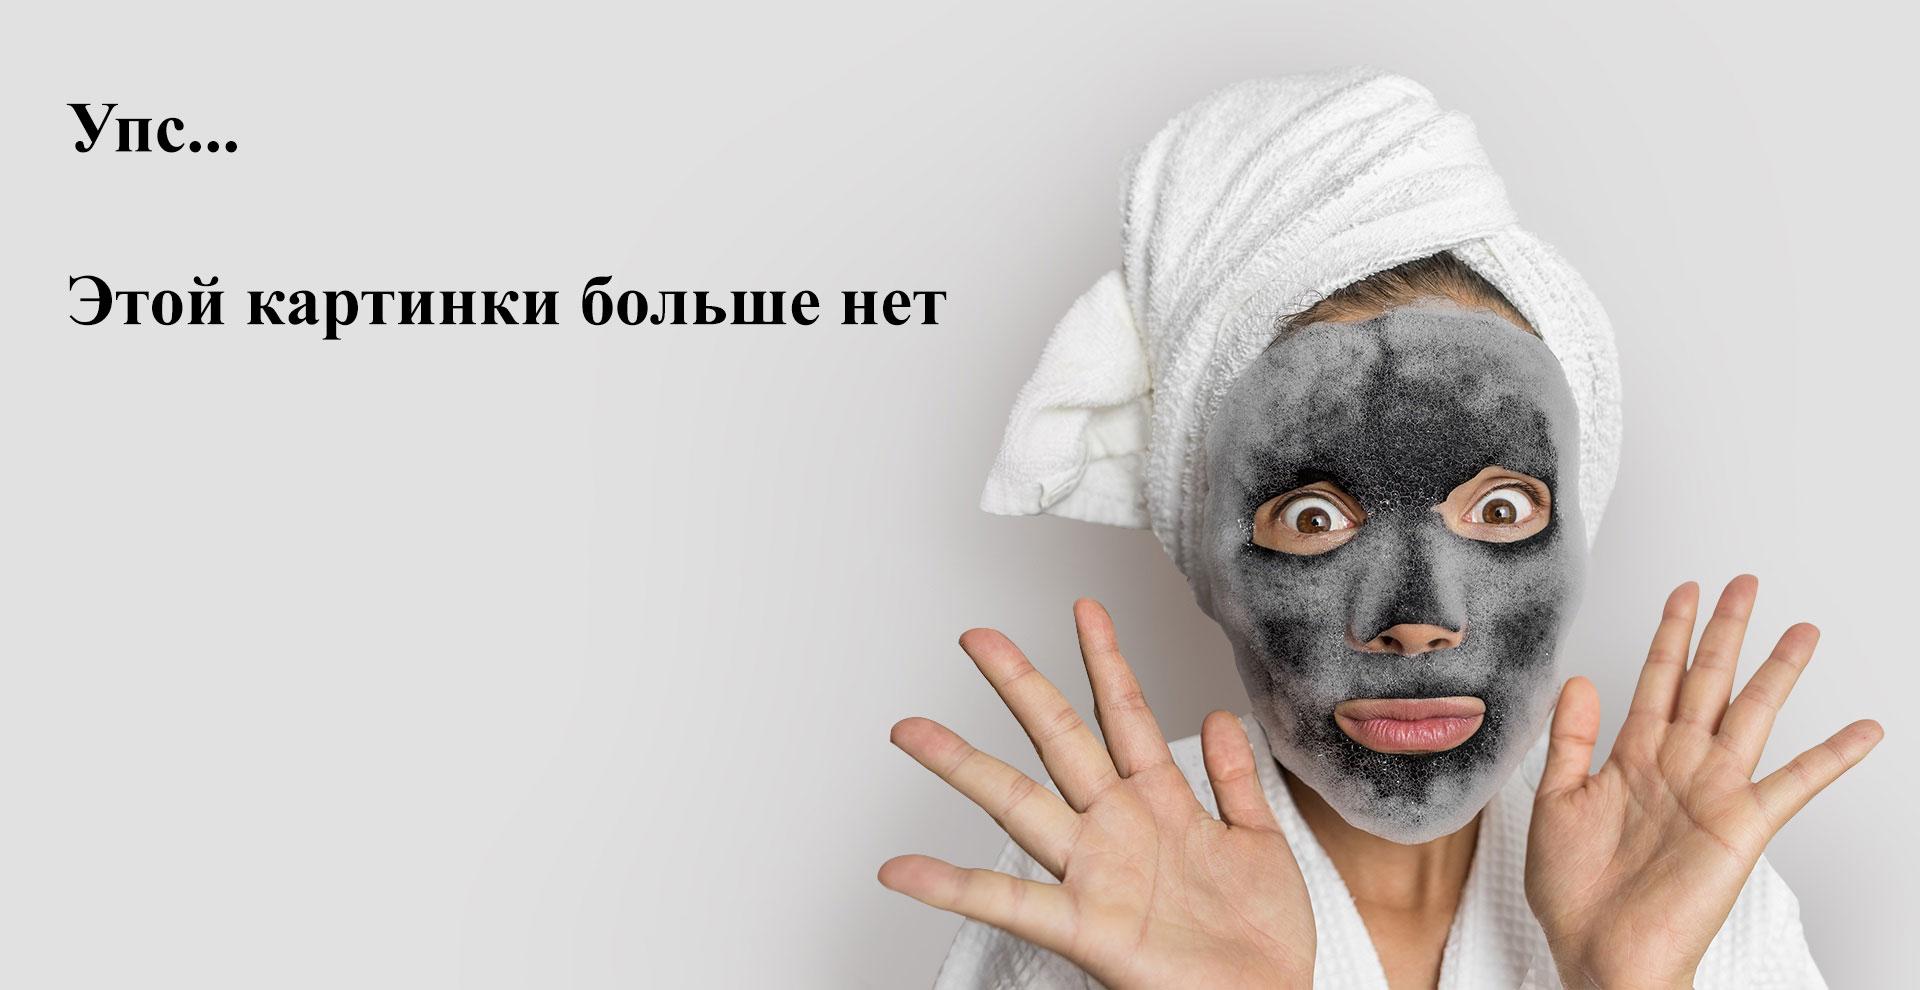 Biore, Увлажняющий гель для снятия макияжа, 170 г